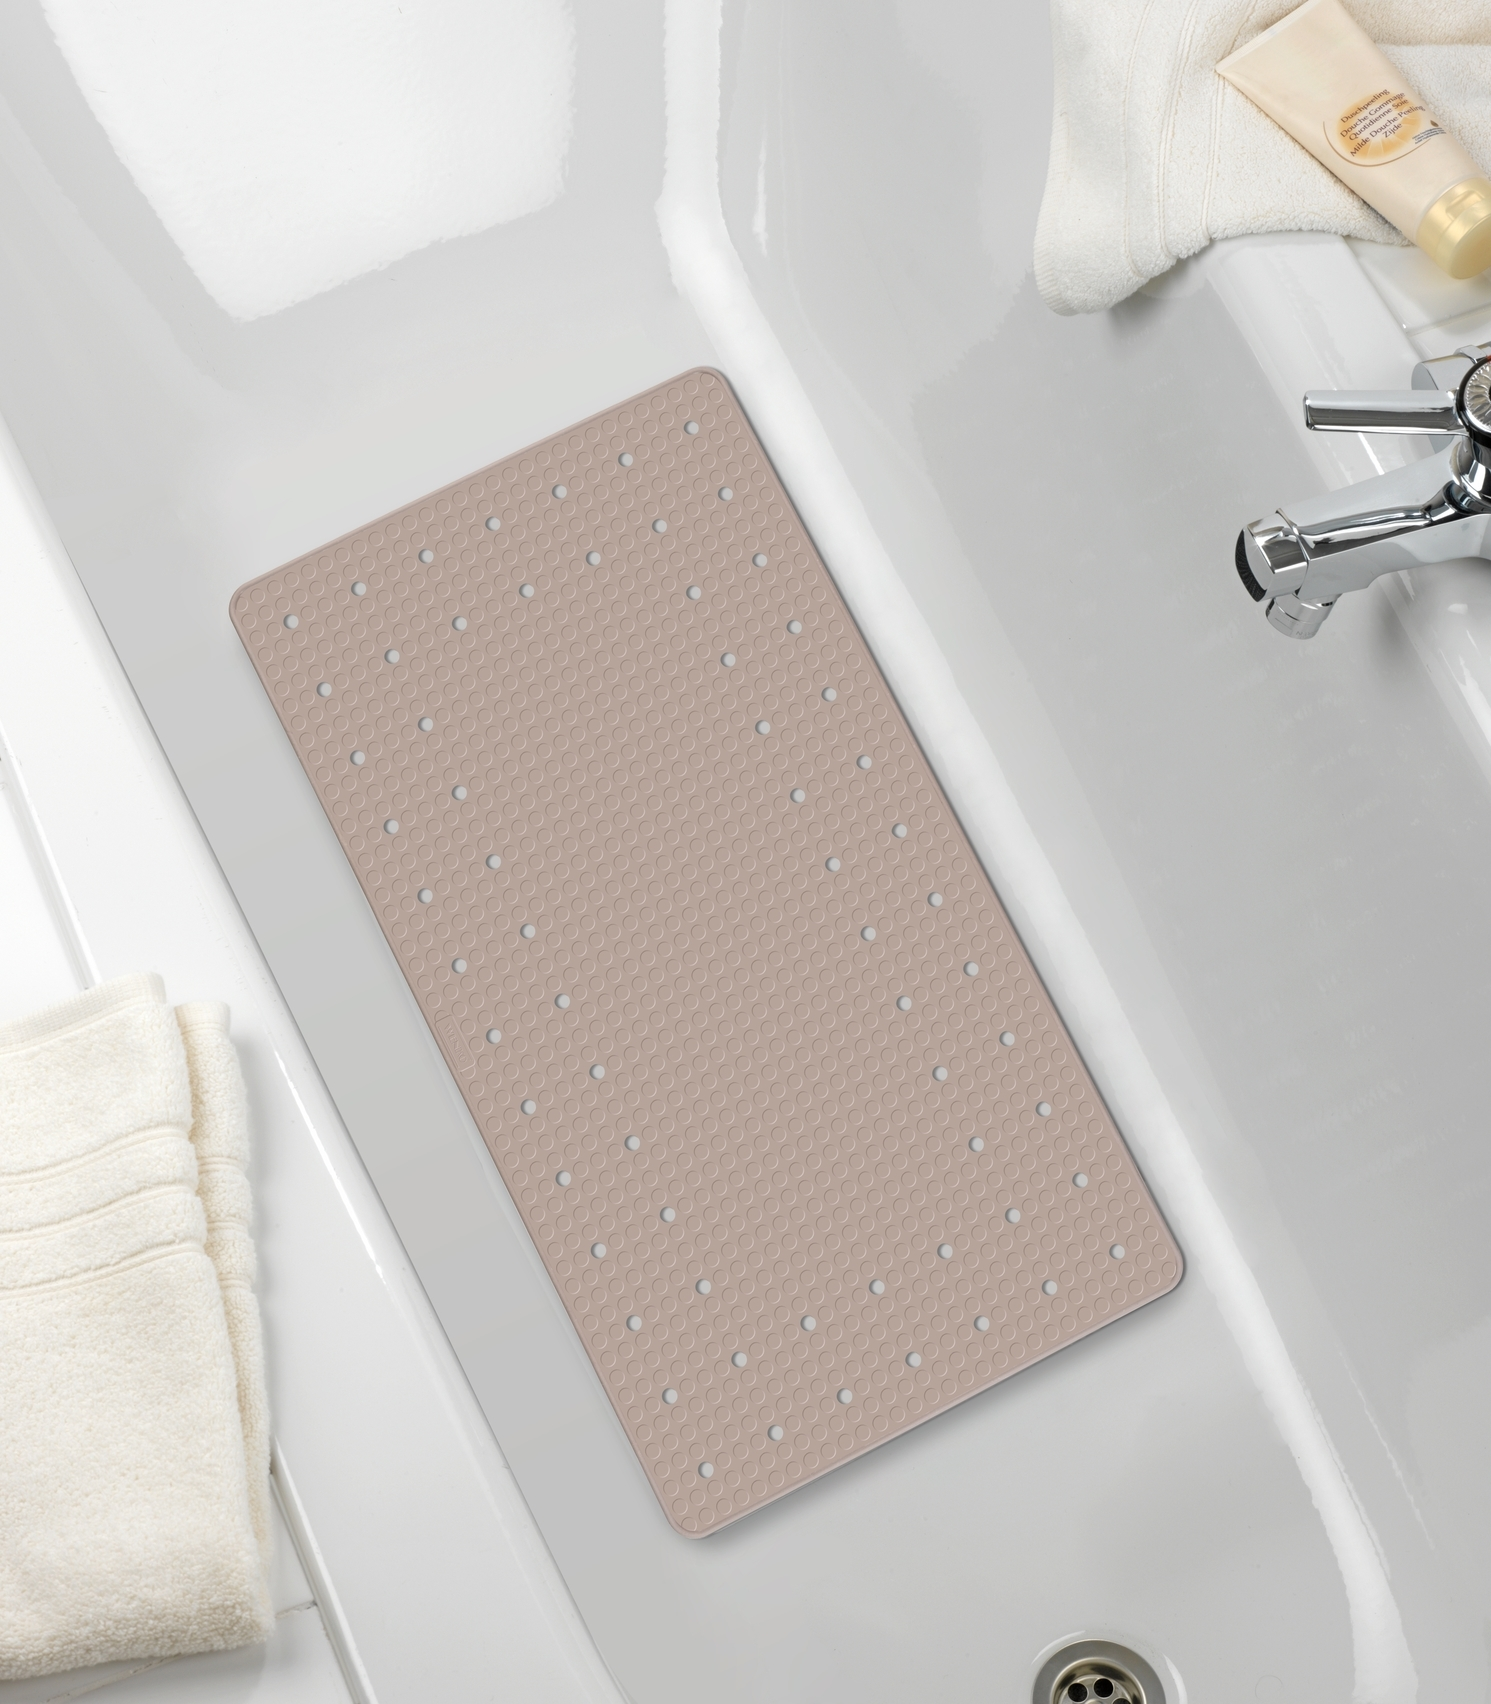 Covoras pentru baie antiderapant, din TPR, Mirasol Taupe, 39 x 69 cm imagine